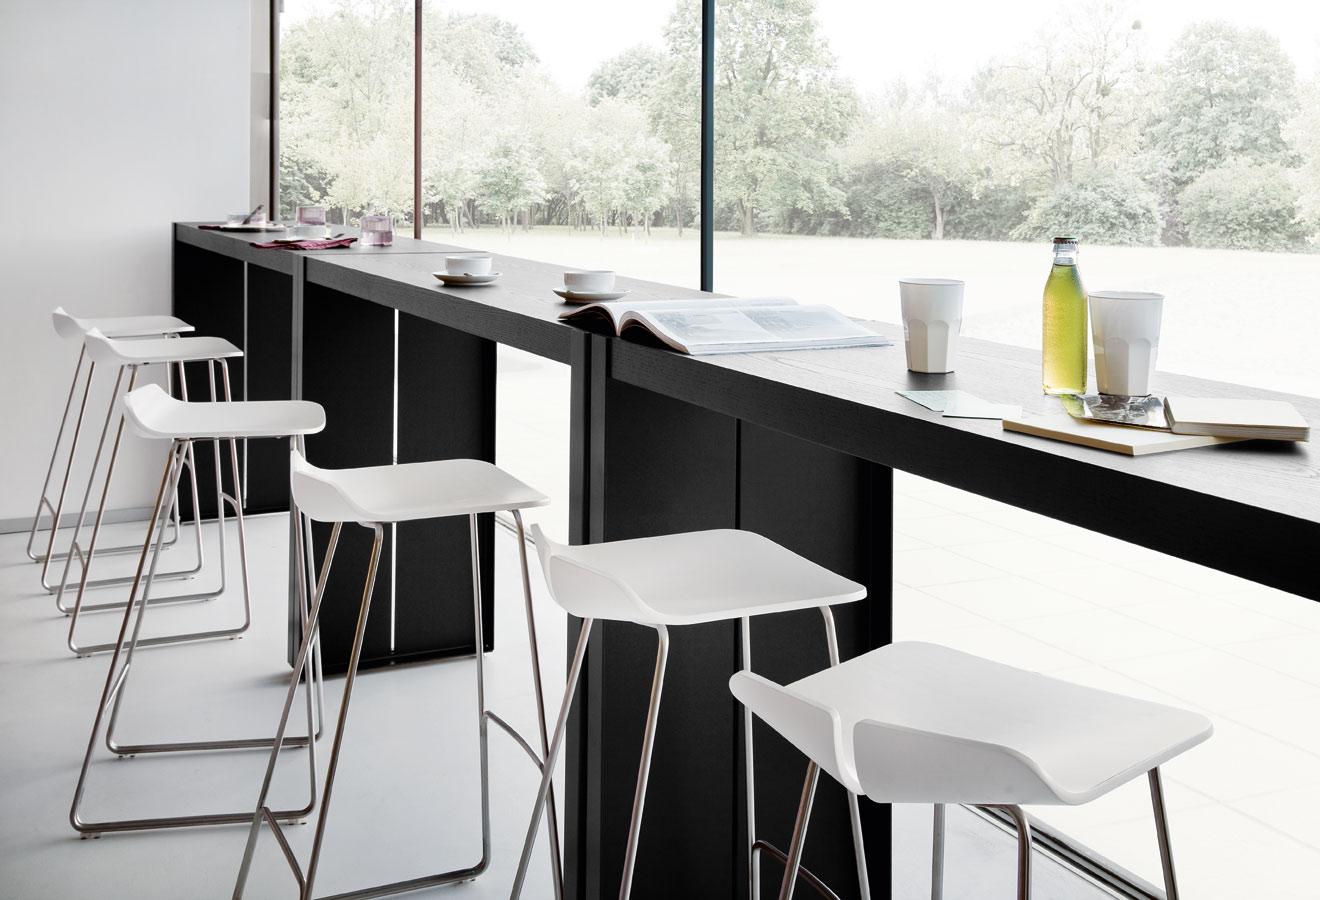 taburetes altos blancos lapalma muebles mallorca